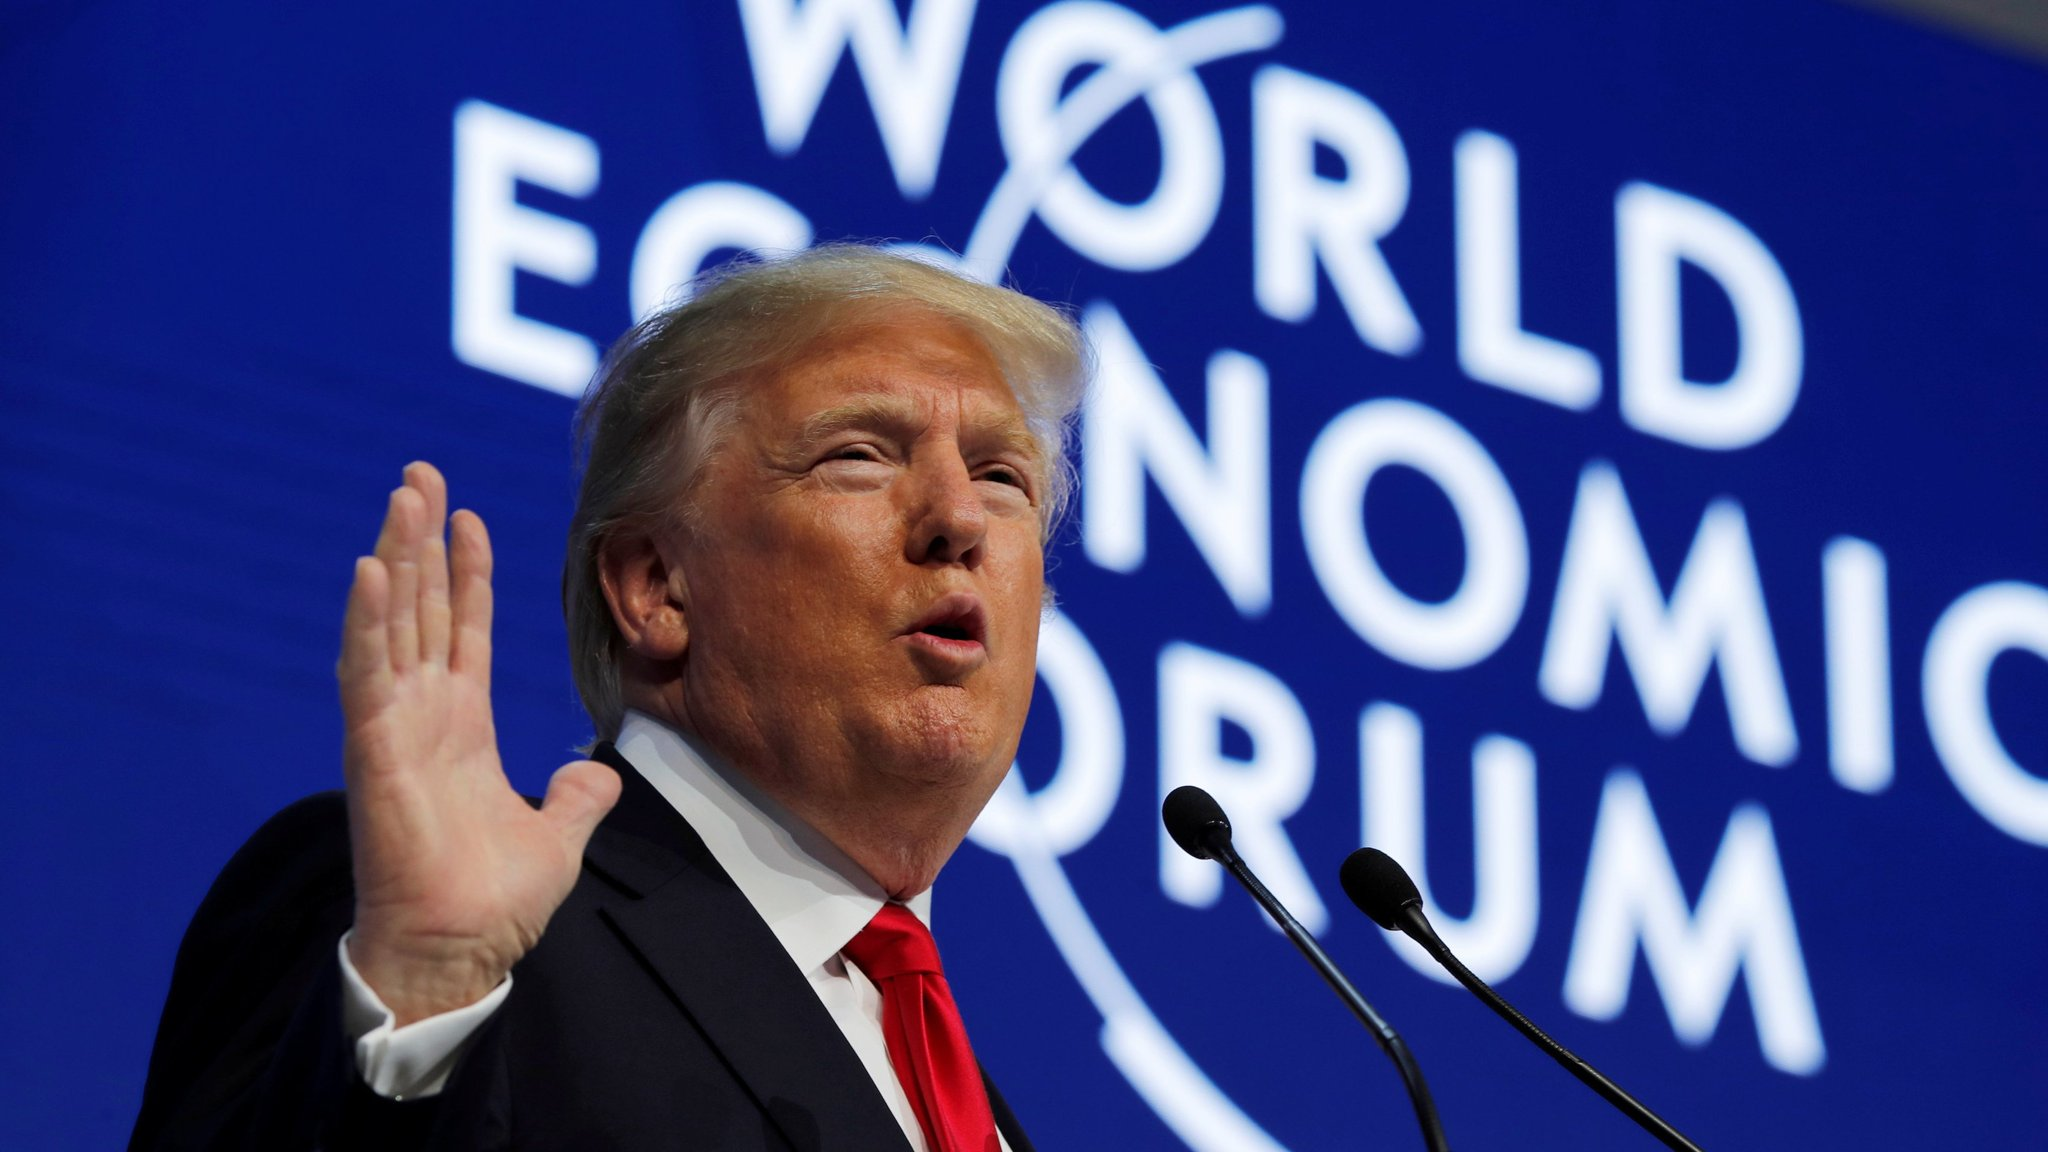 Trump tells Davos 'America First not America alone'